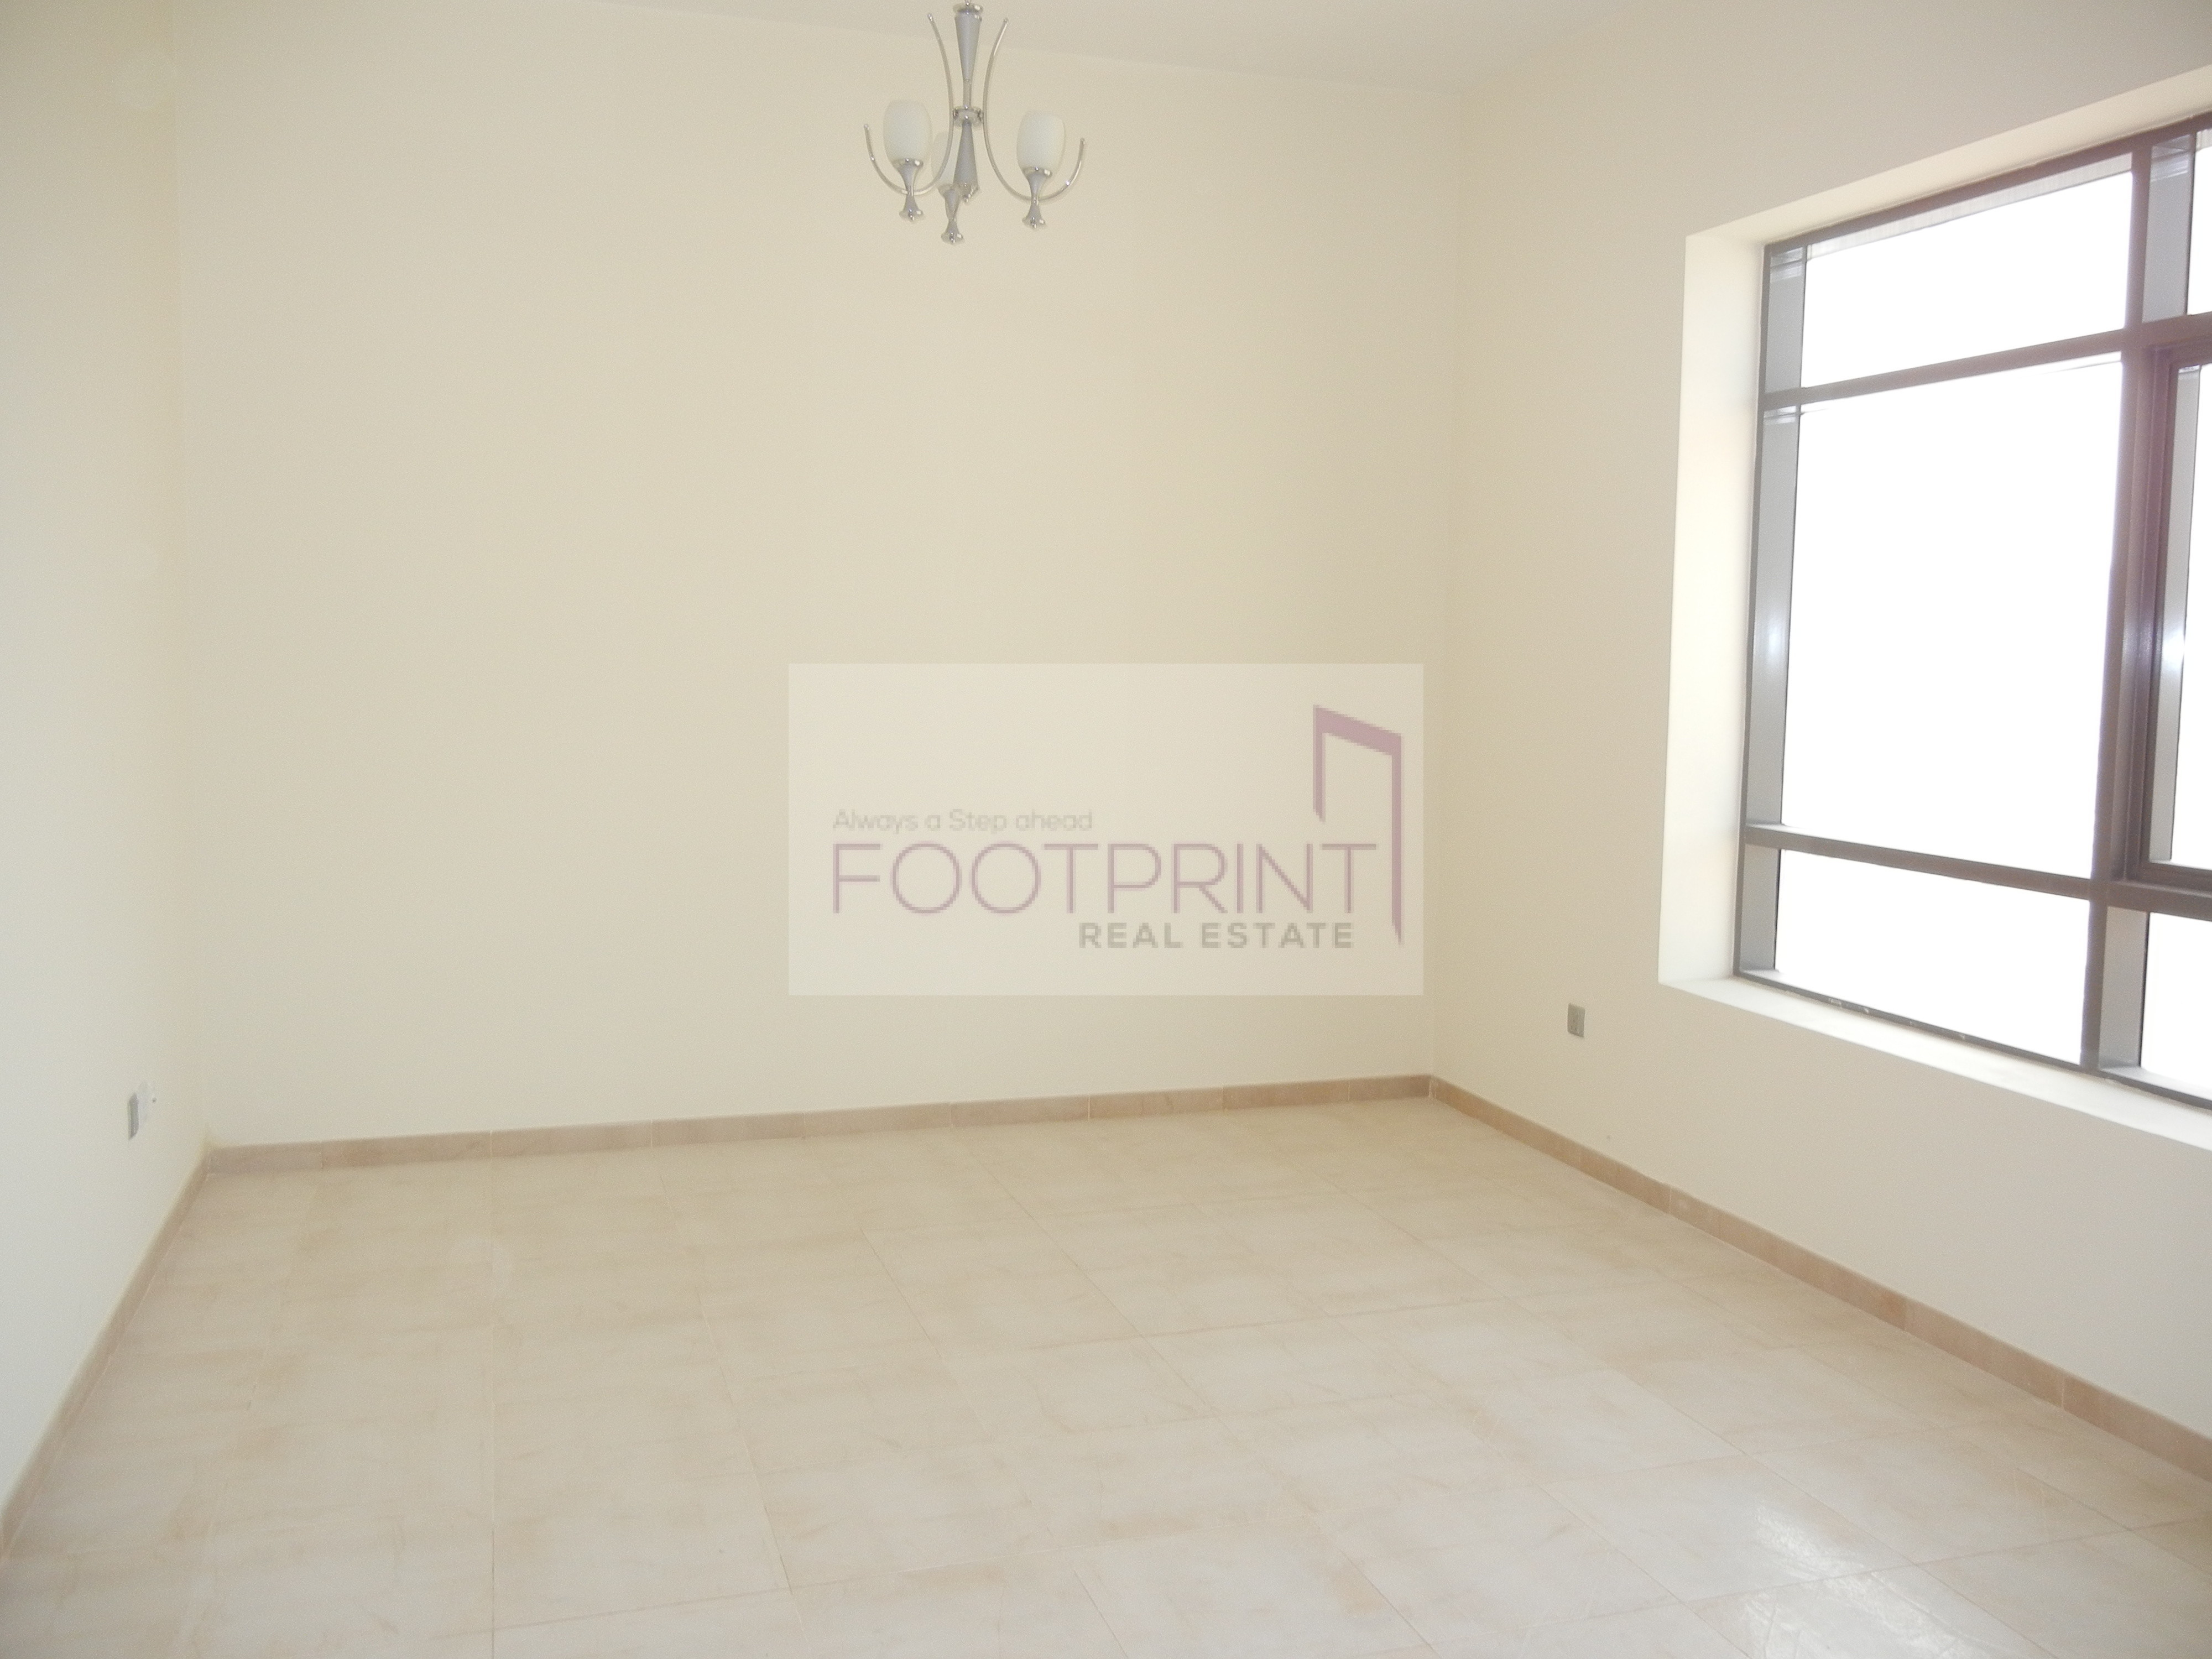 Rented Studio For Sale in Hamza Tower!!!